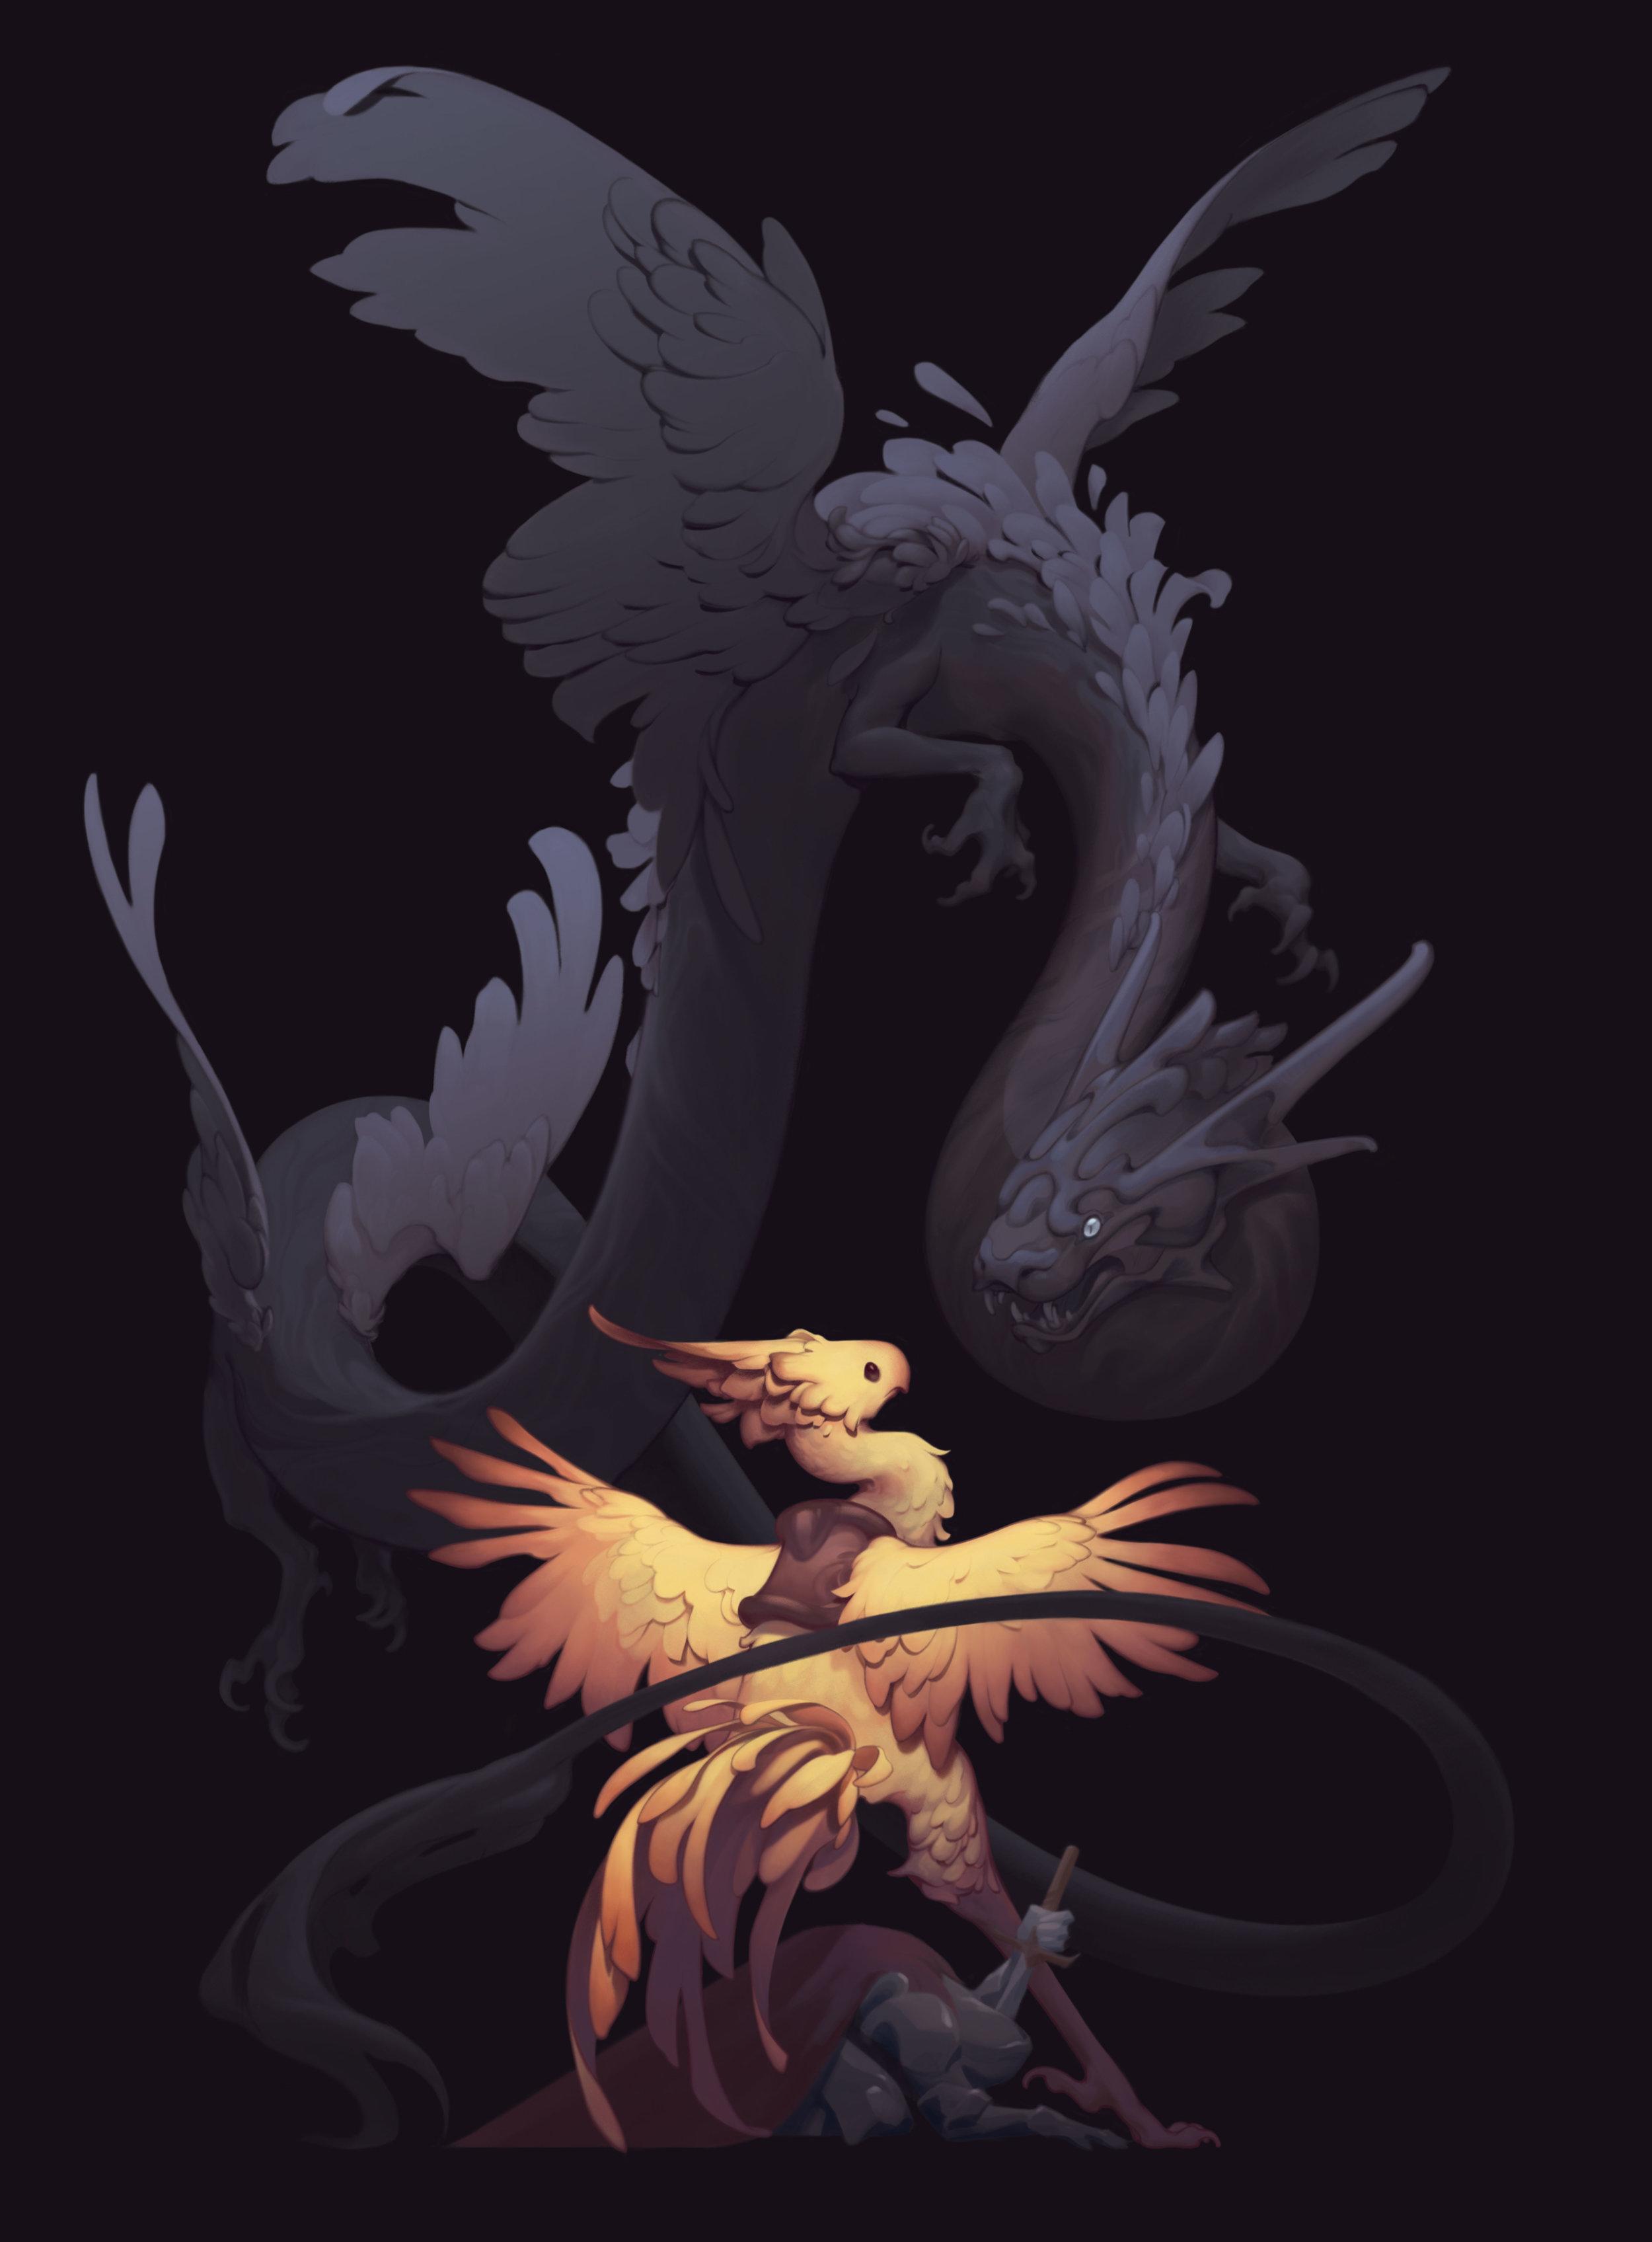 Chocobo Tribute / Final Fantasy 30th Anniversary Fanzine